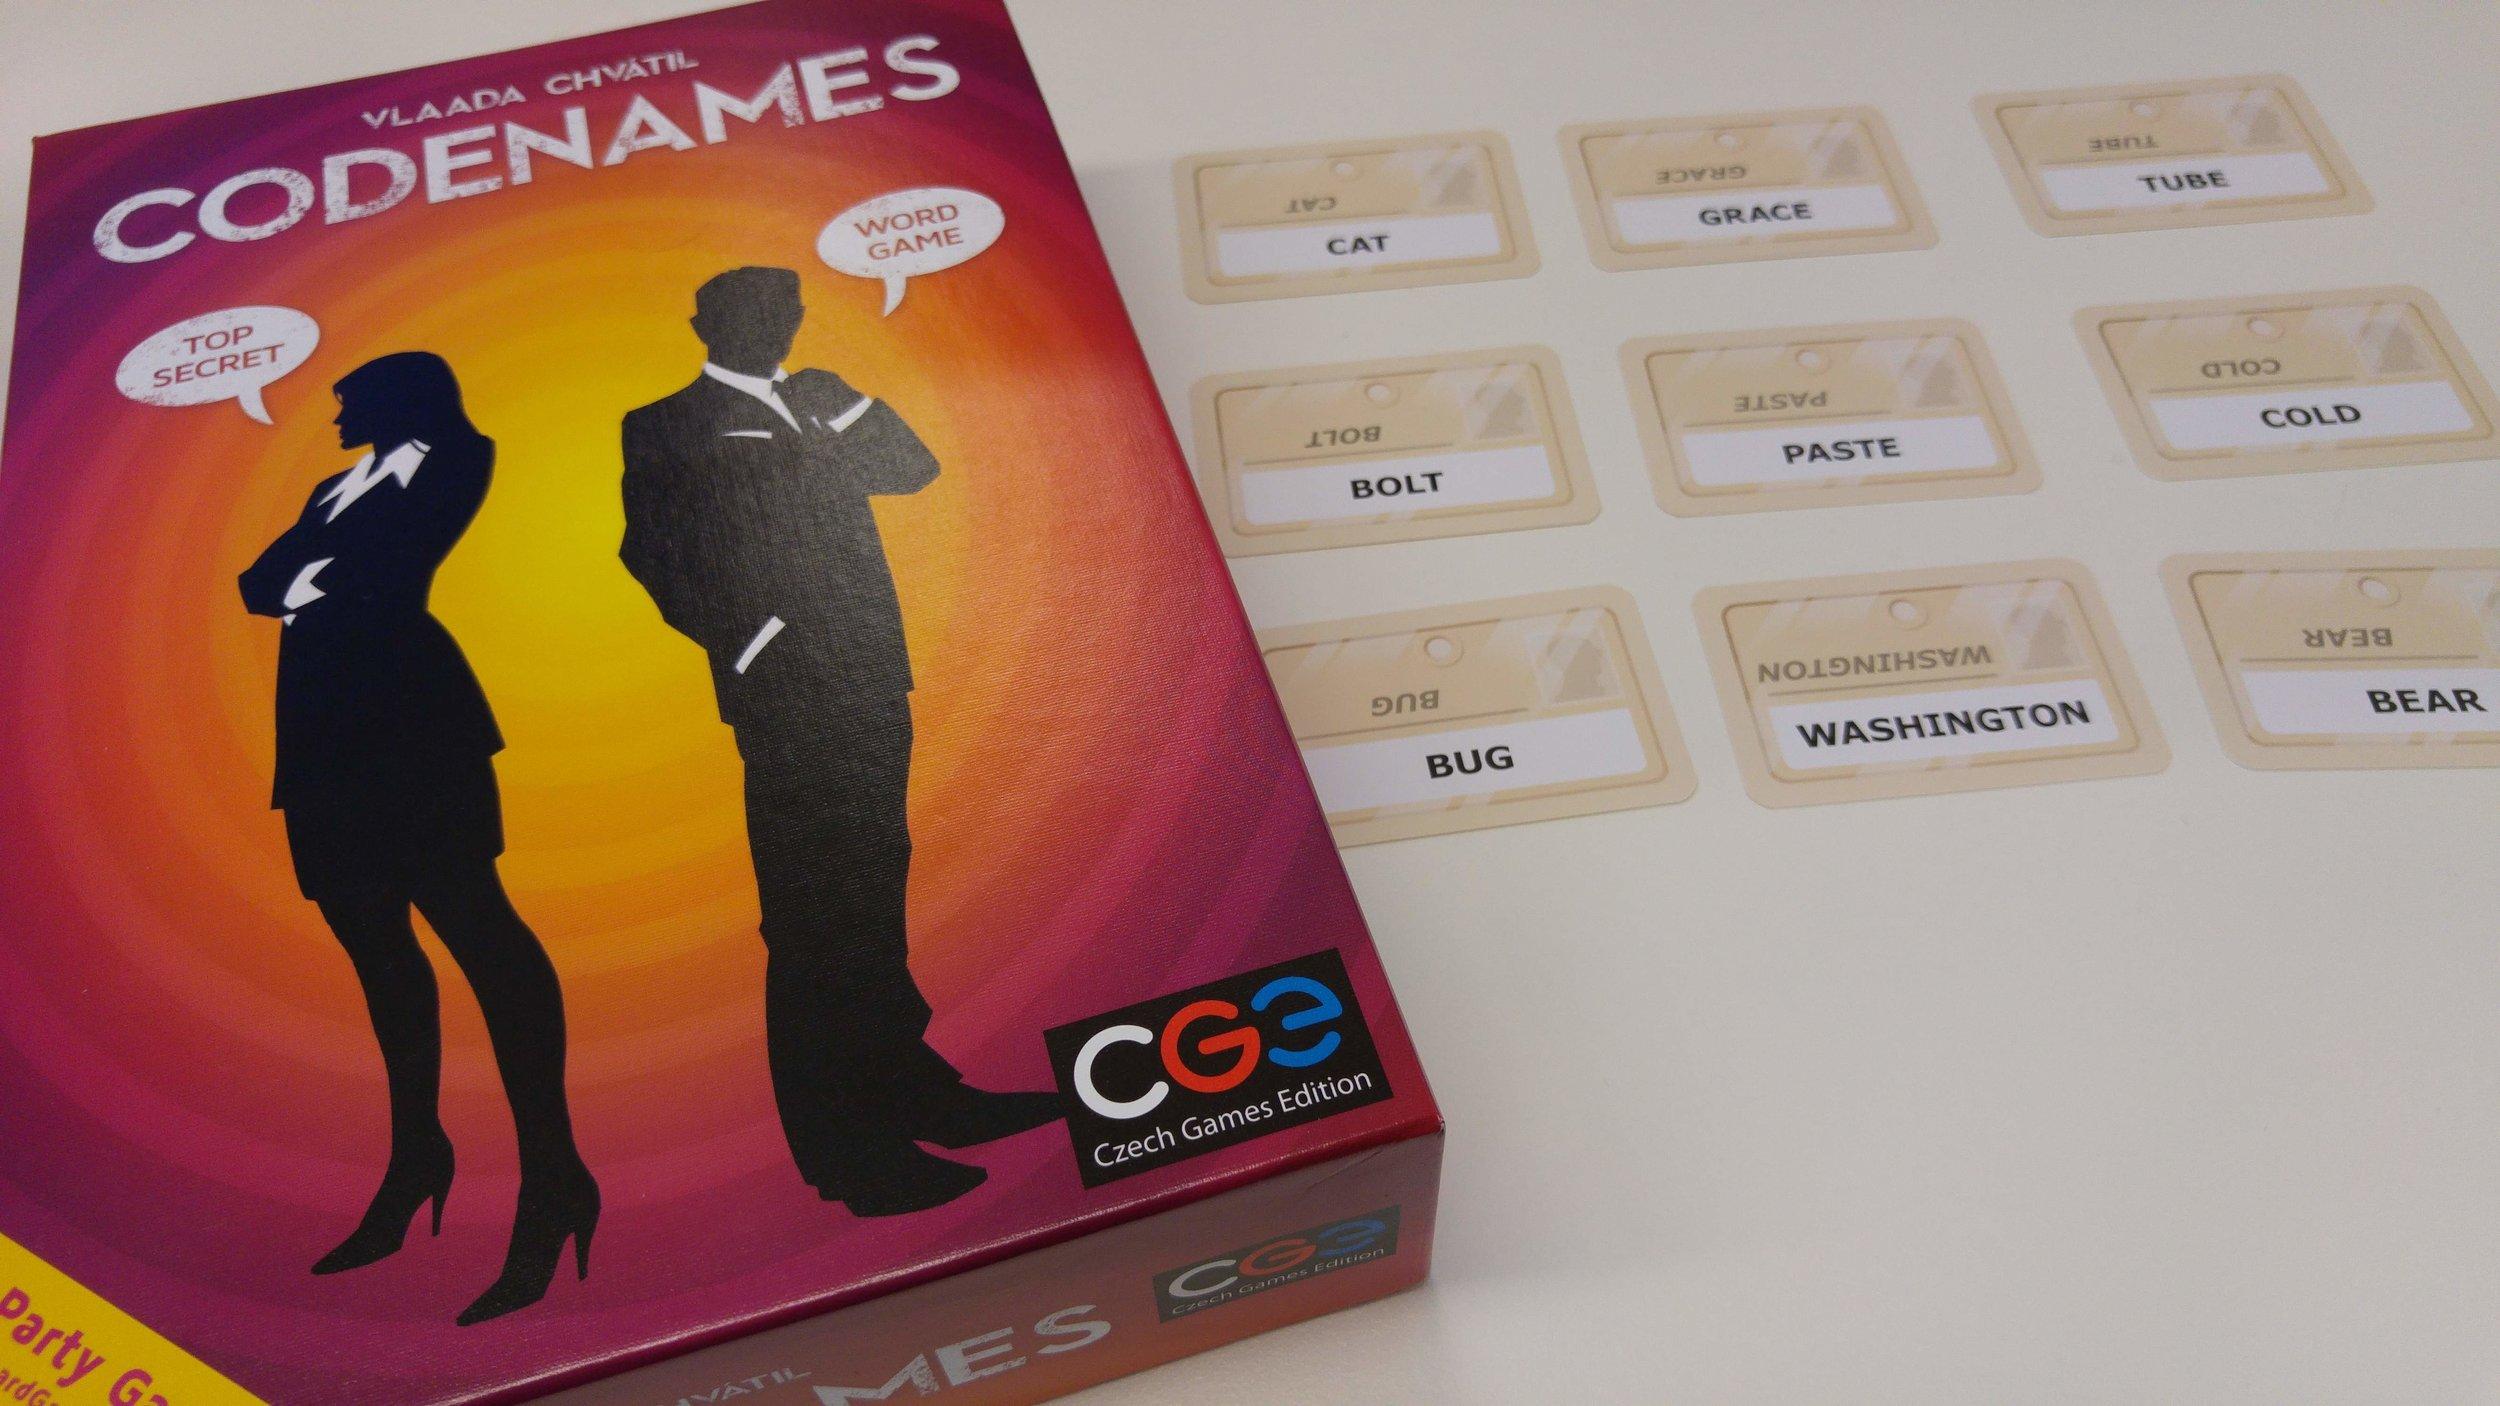 codenames-box-and-cards.jpg